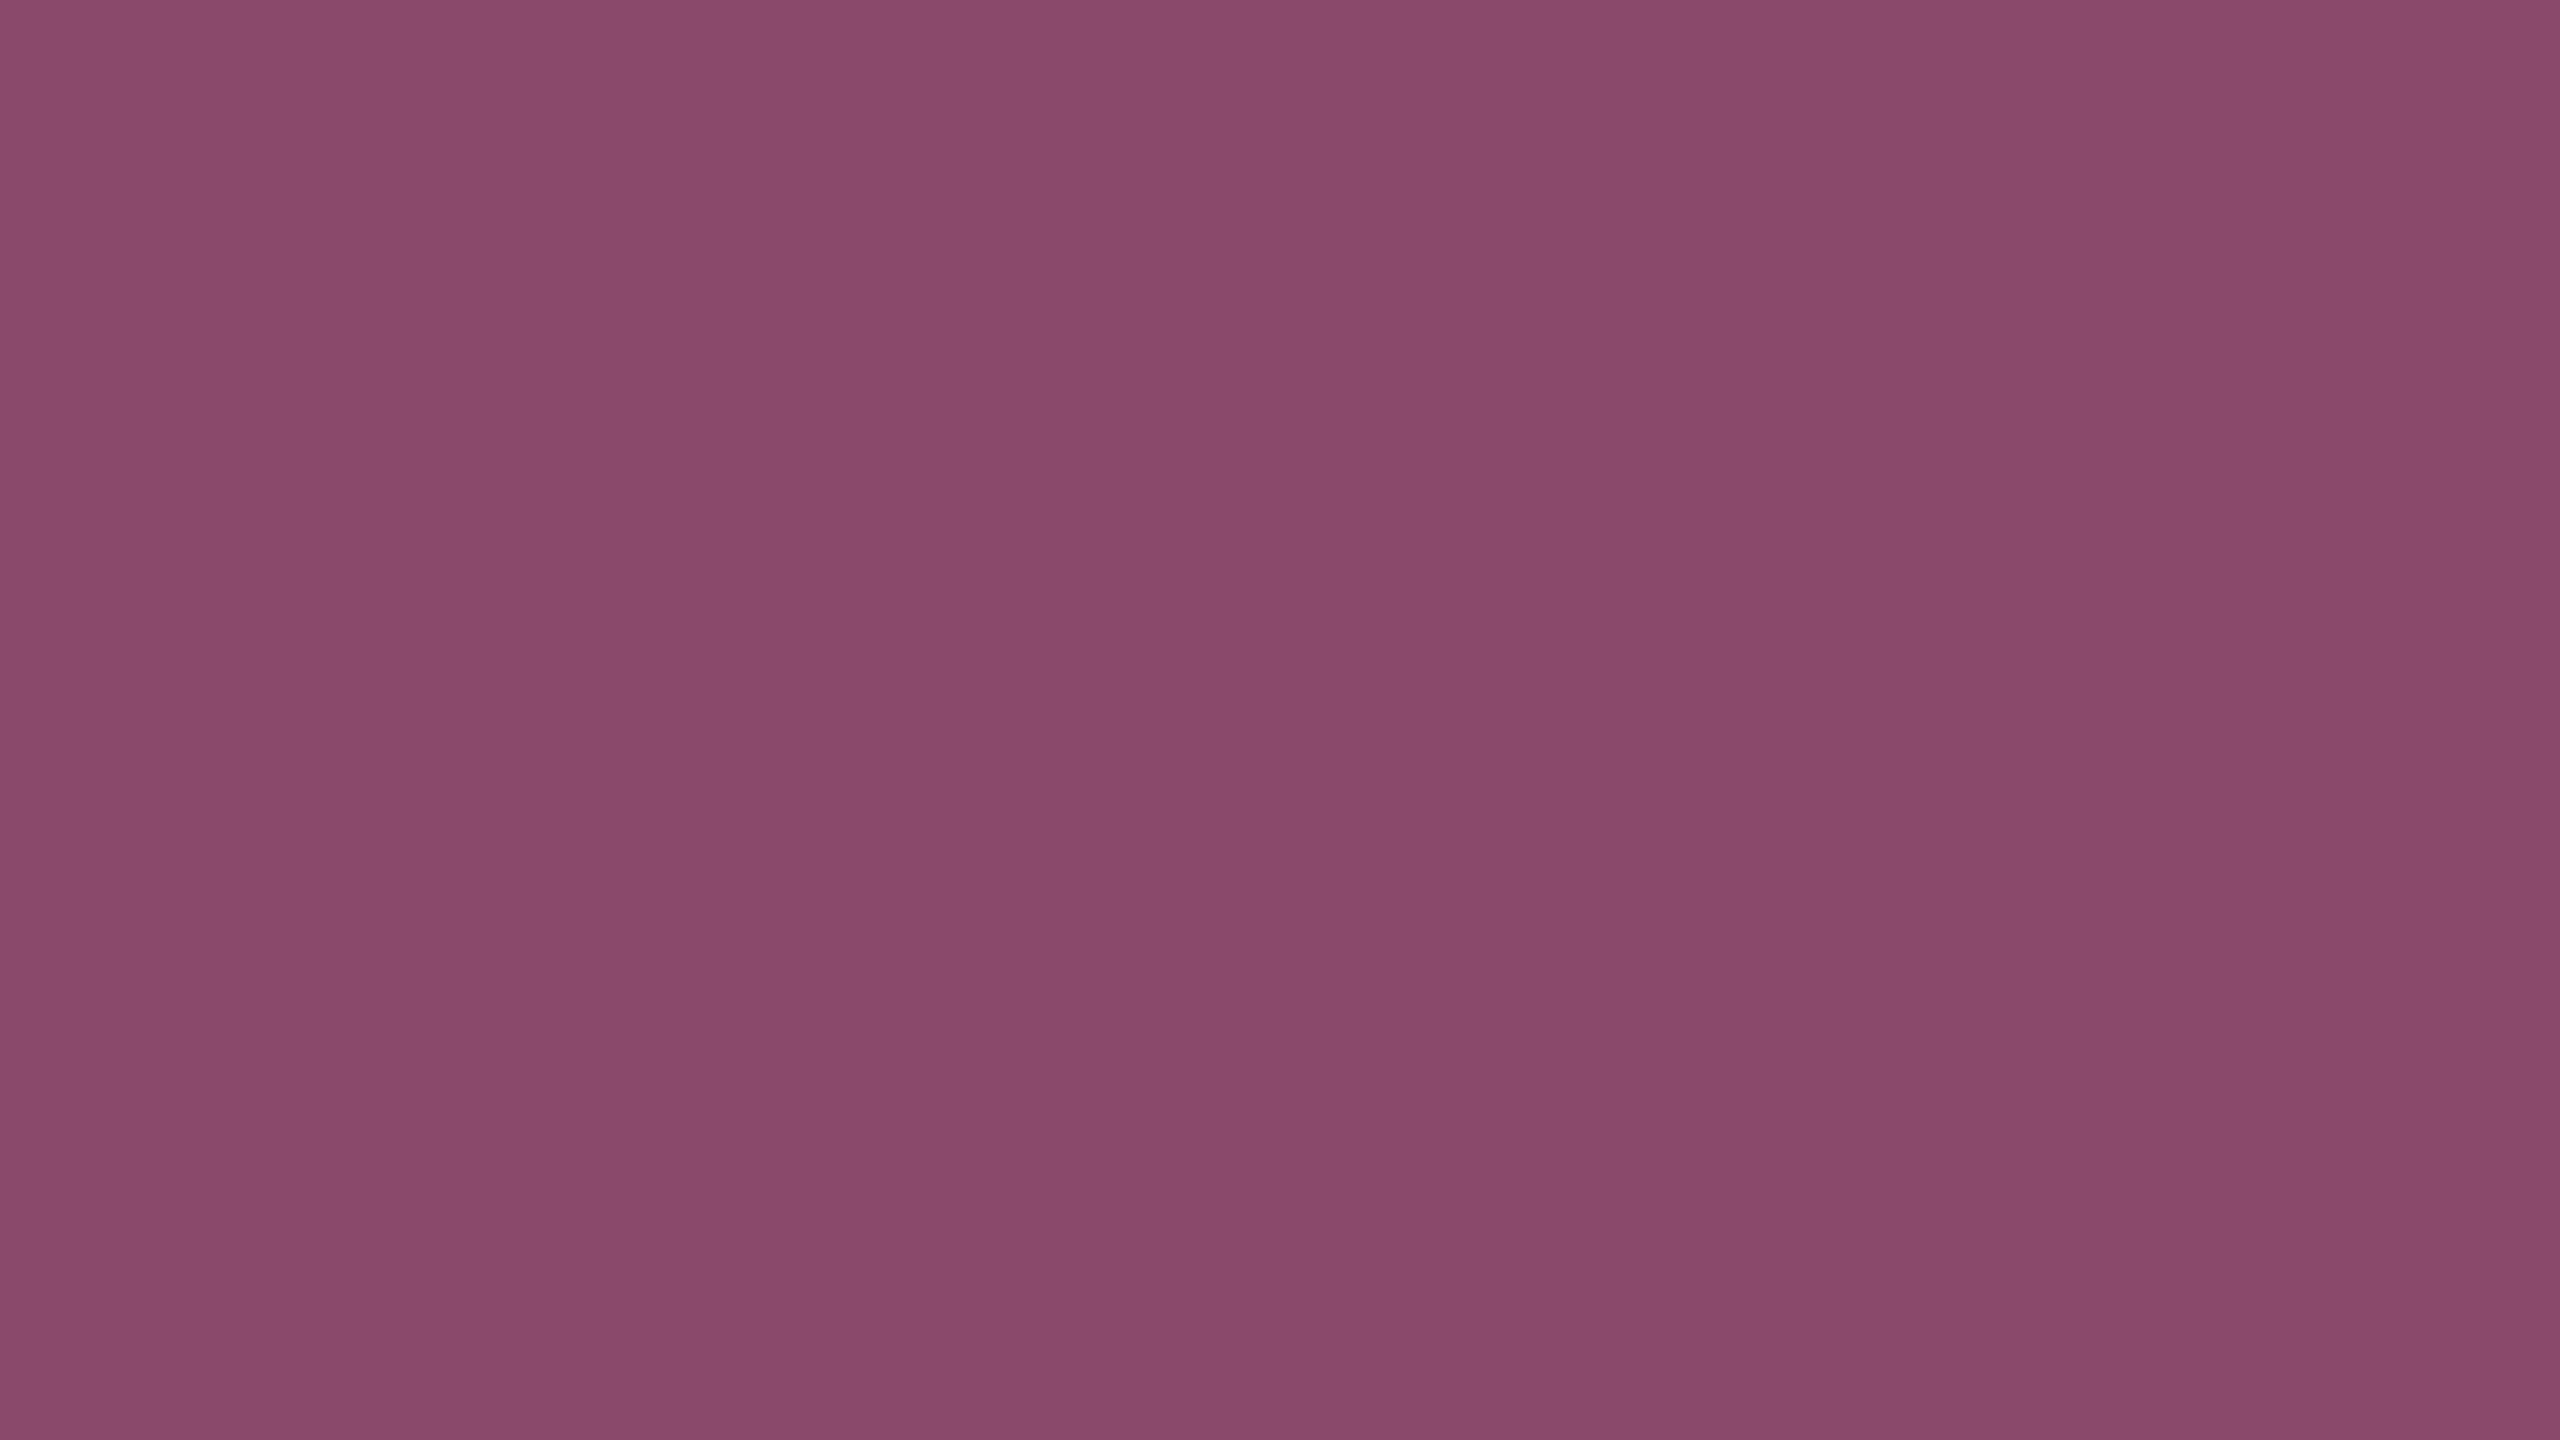 2560x1440 Twilight Lavender Solid Color Background